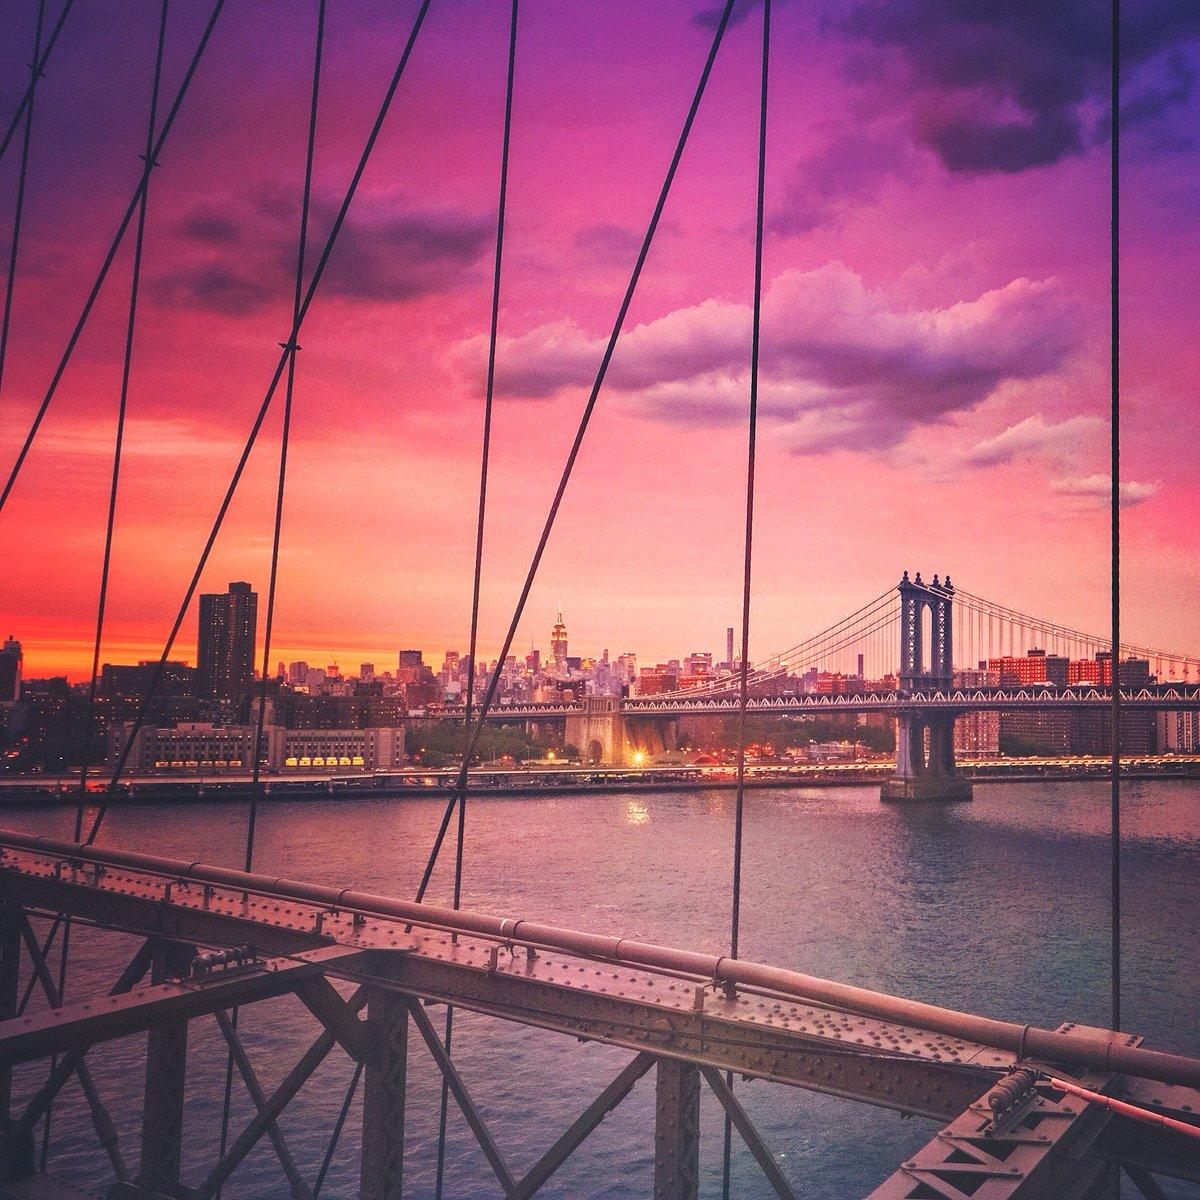 Manhattan Bridge by @travelinglens #newyork #nyc<br>http://pic.twitter.com/B5evoHsIg0